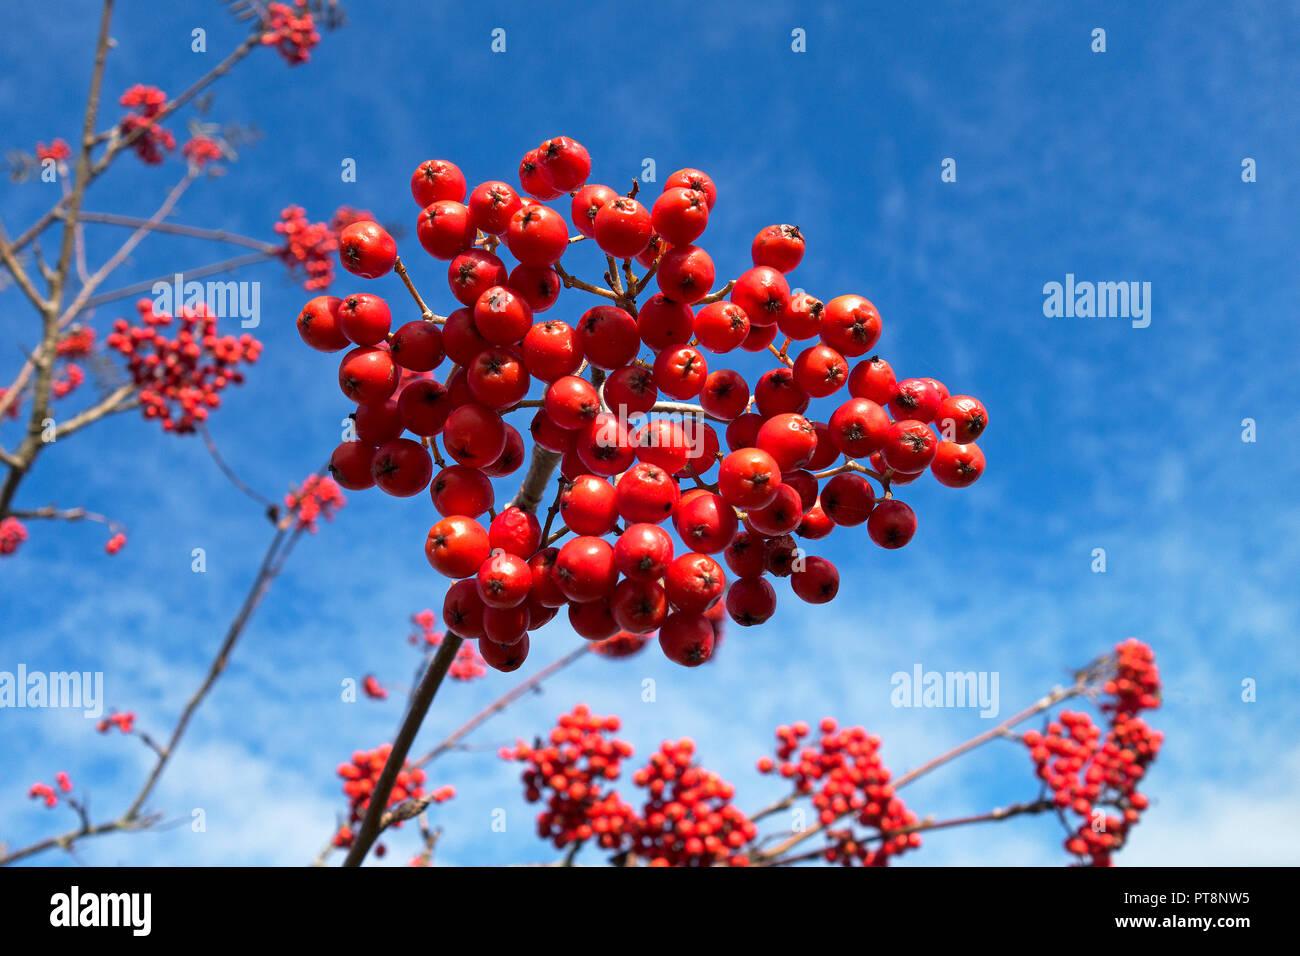 Rowan berries on mountain ash, Rowan Tree, sur fond de ciel bleu. Photo Stock